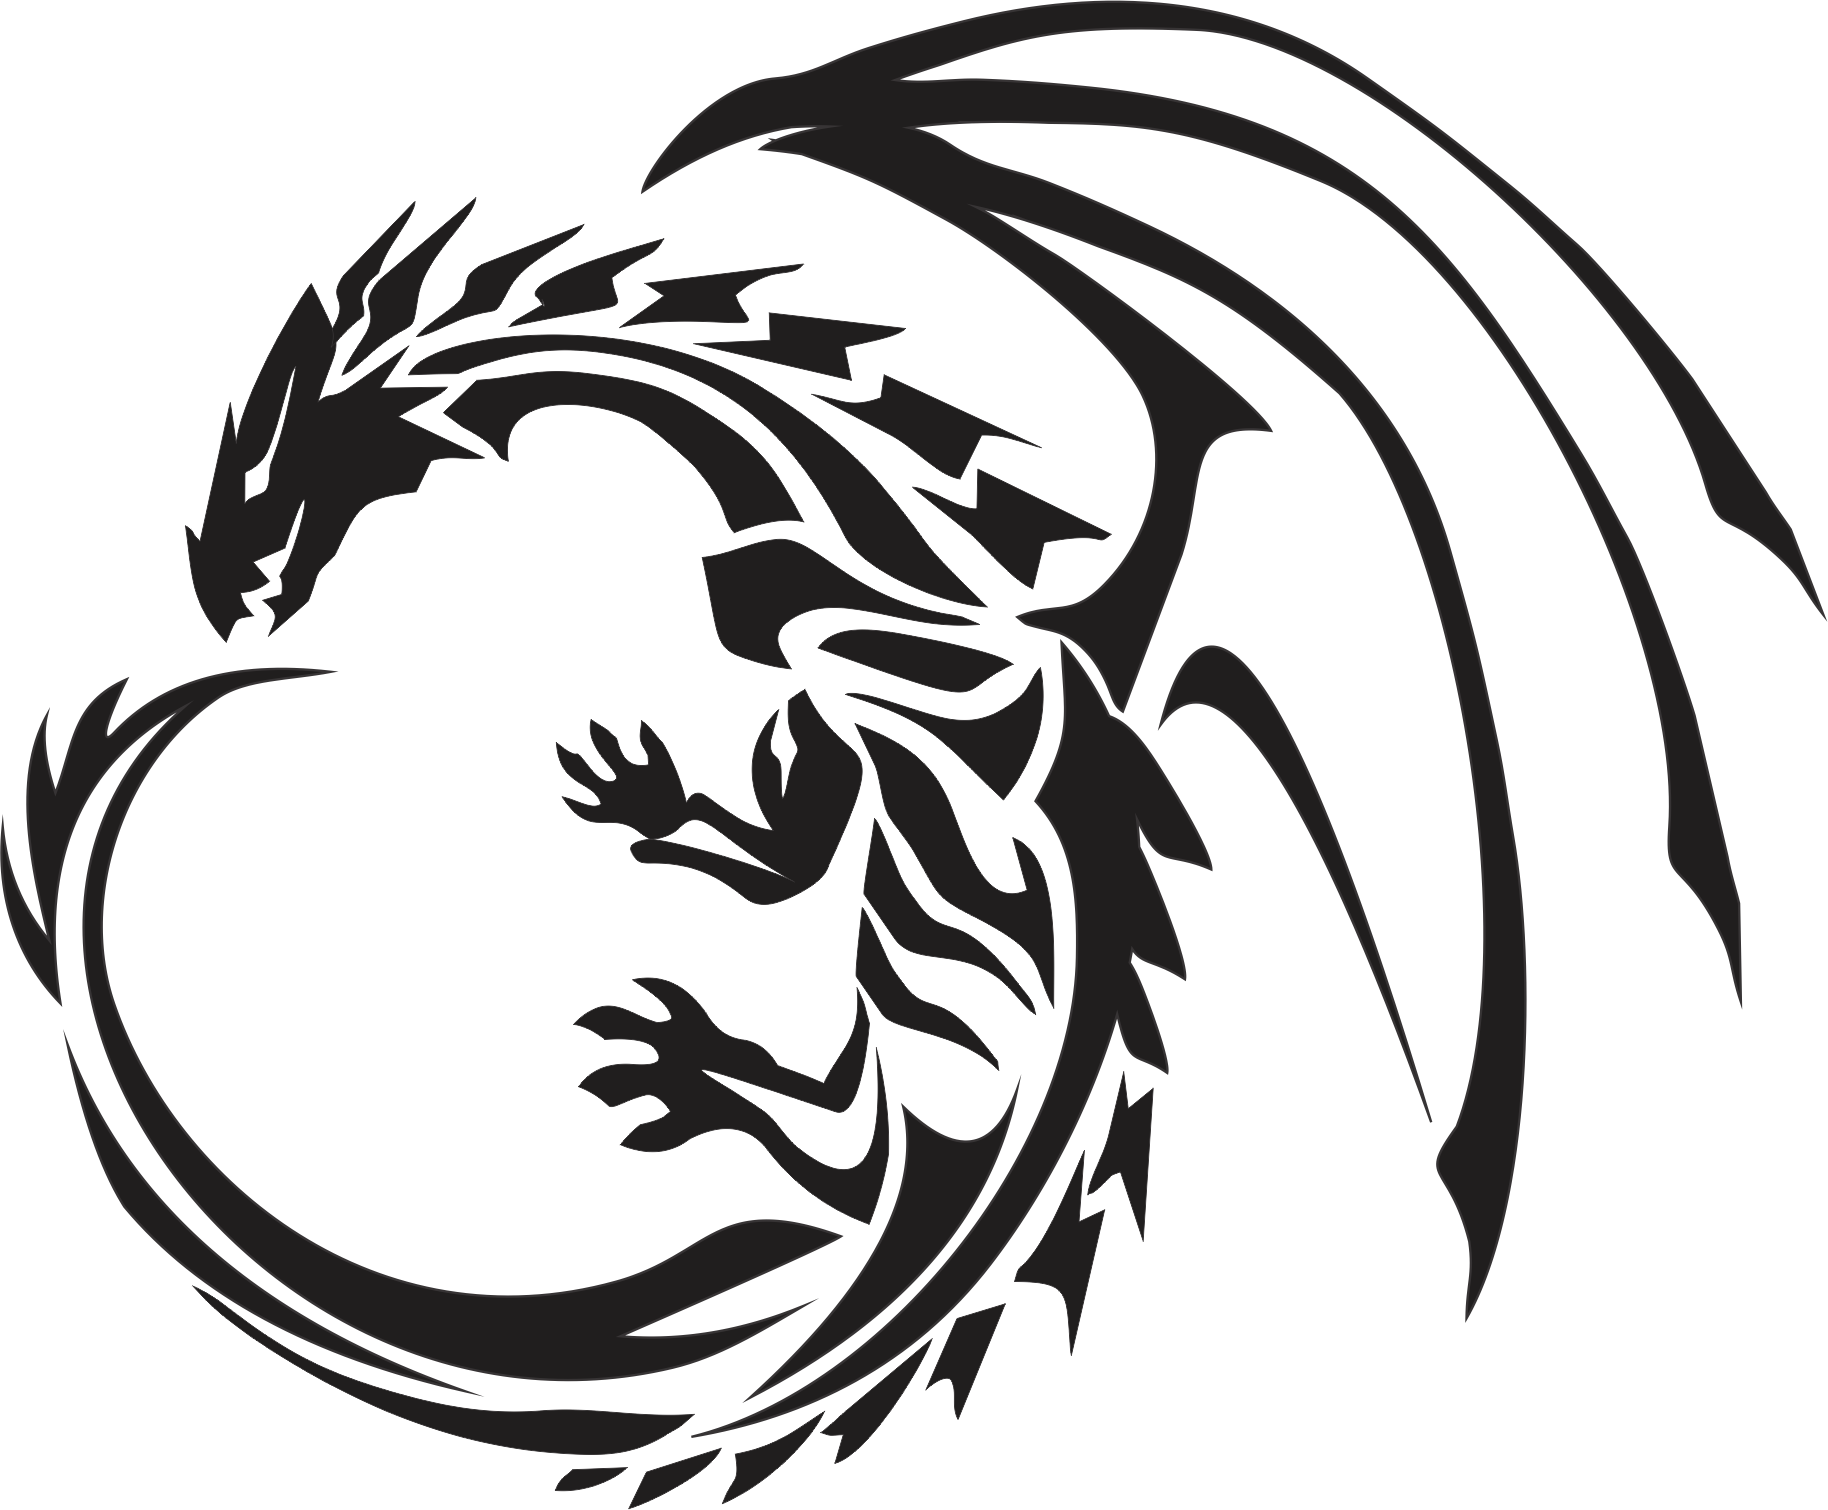 City of Carson Tribal dragon tattoos, Dragon tattoo